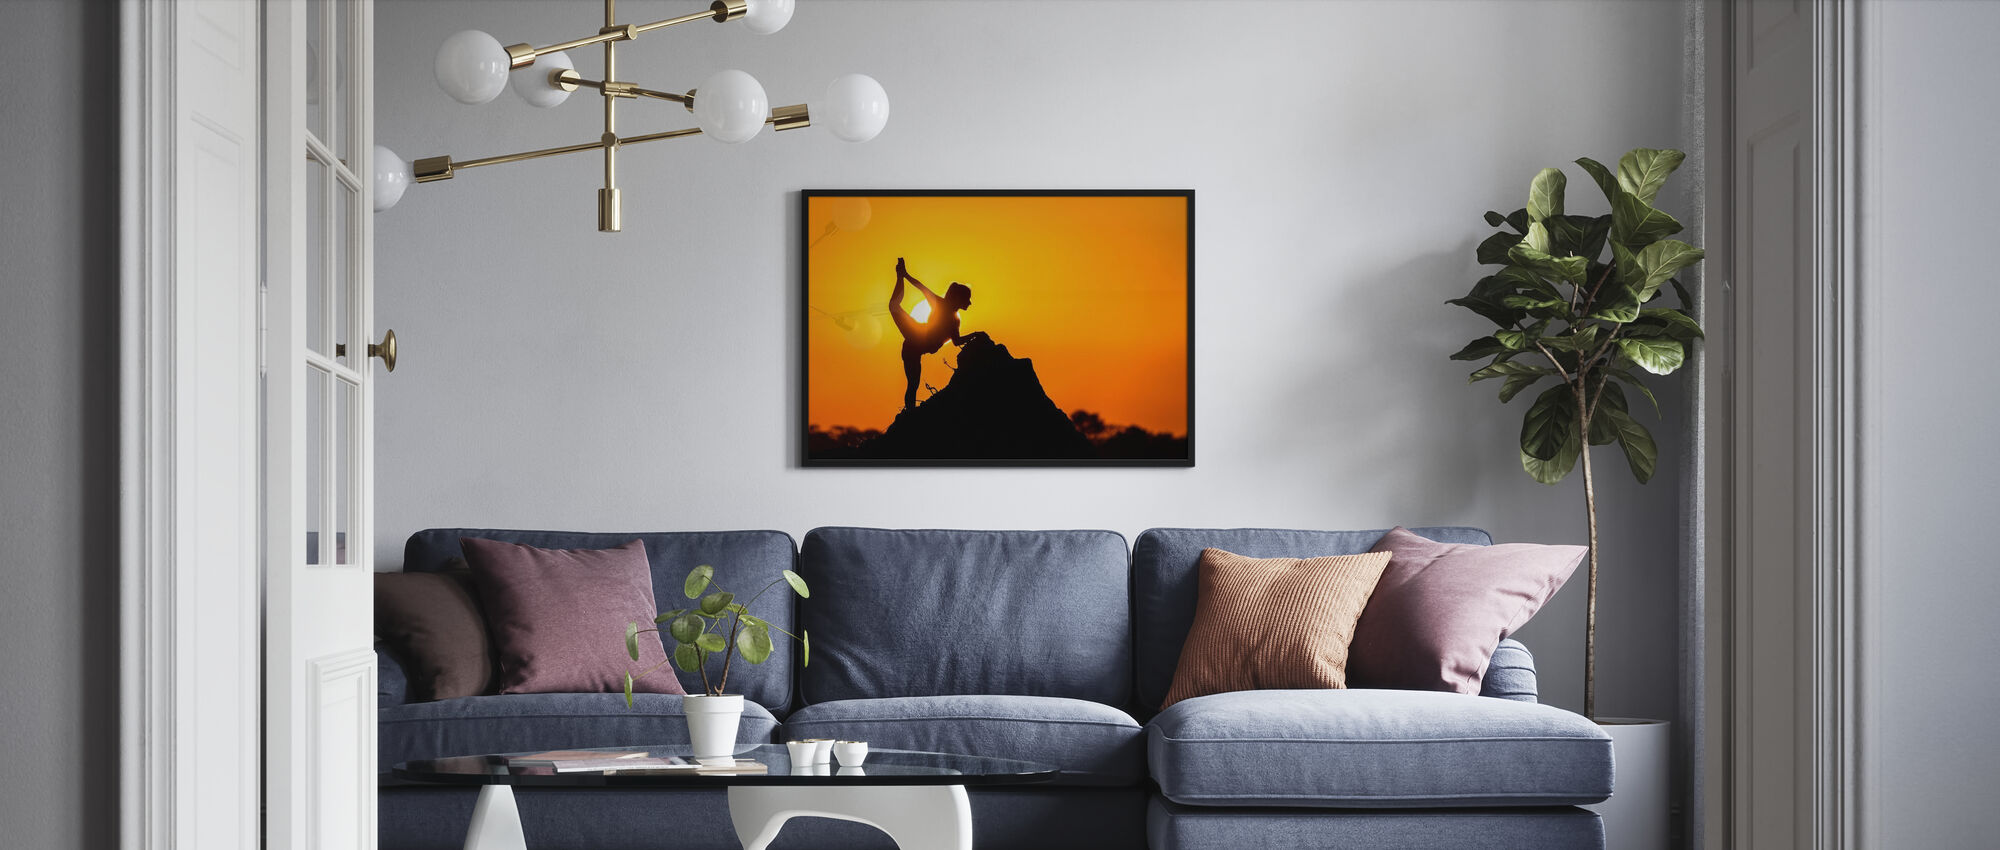 Savanne-danseres - Poster - Woonkamer